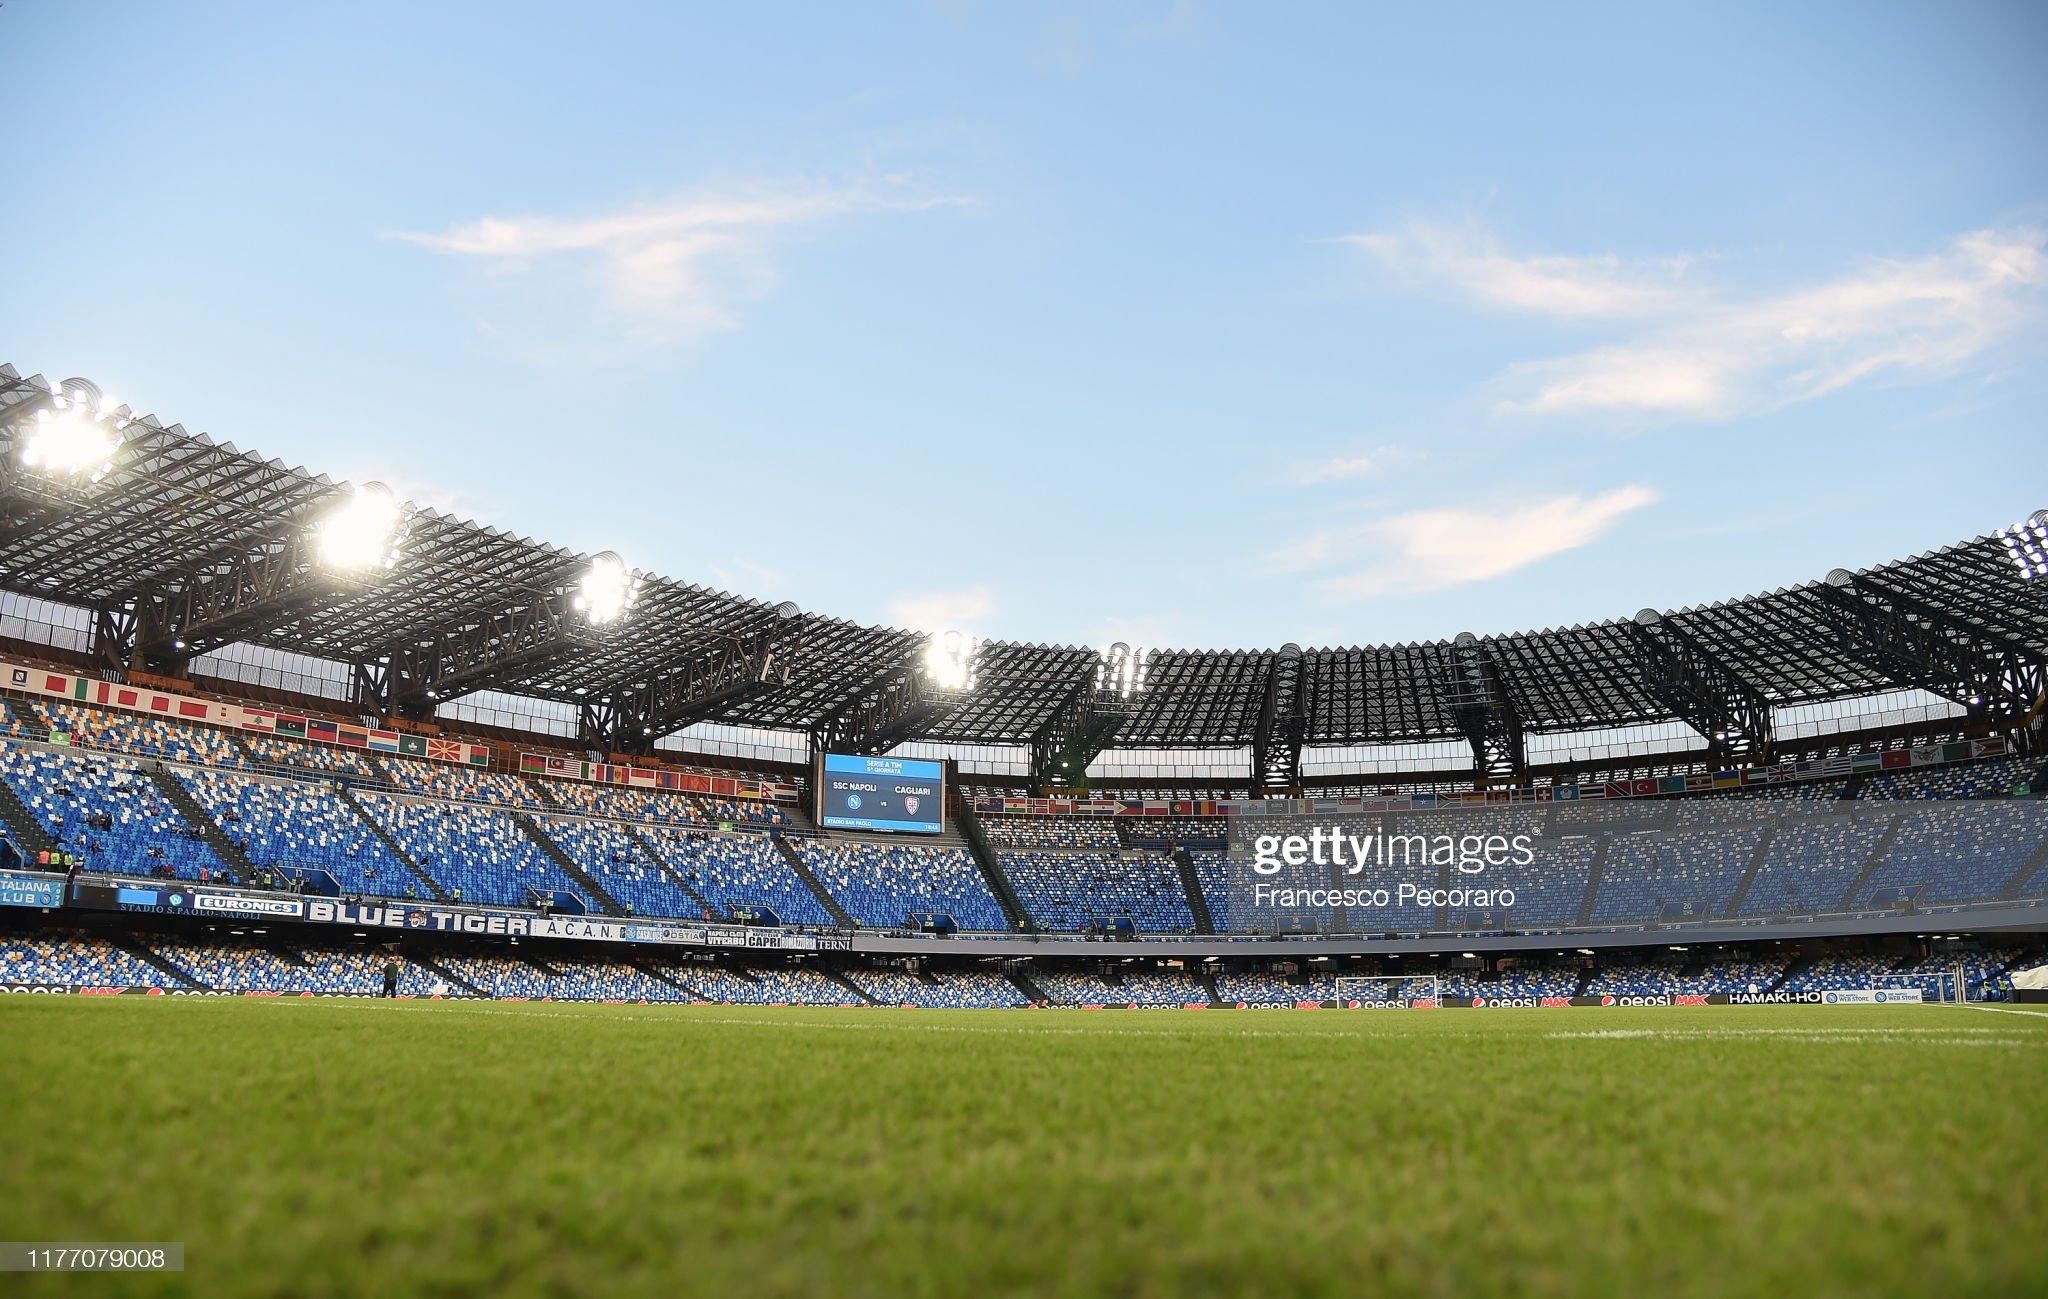 Napoli v Inter preview, prediction and odds